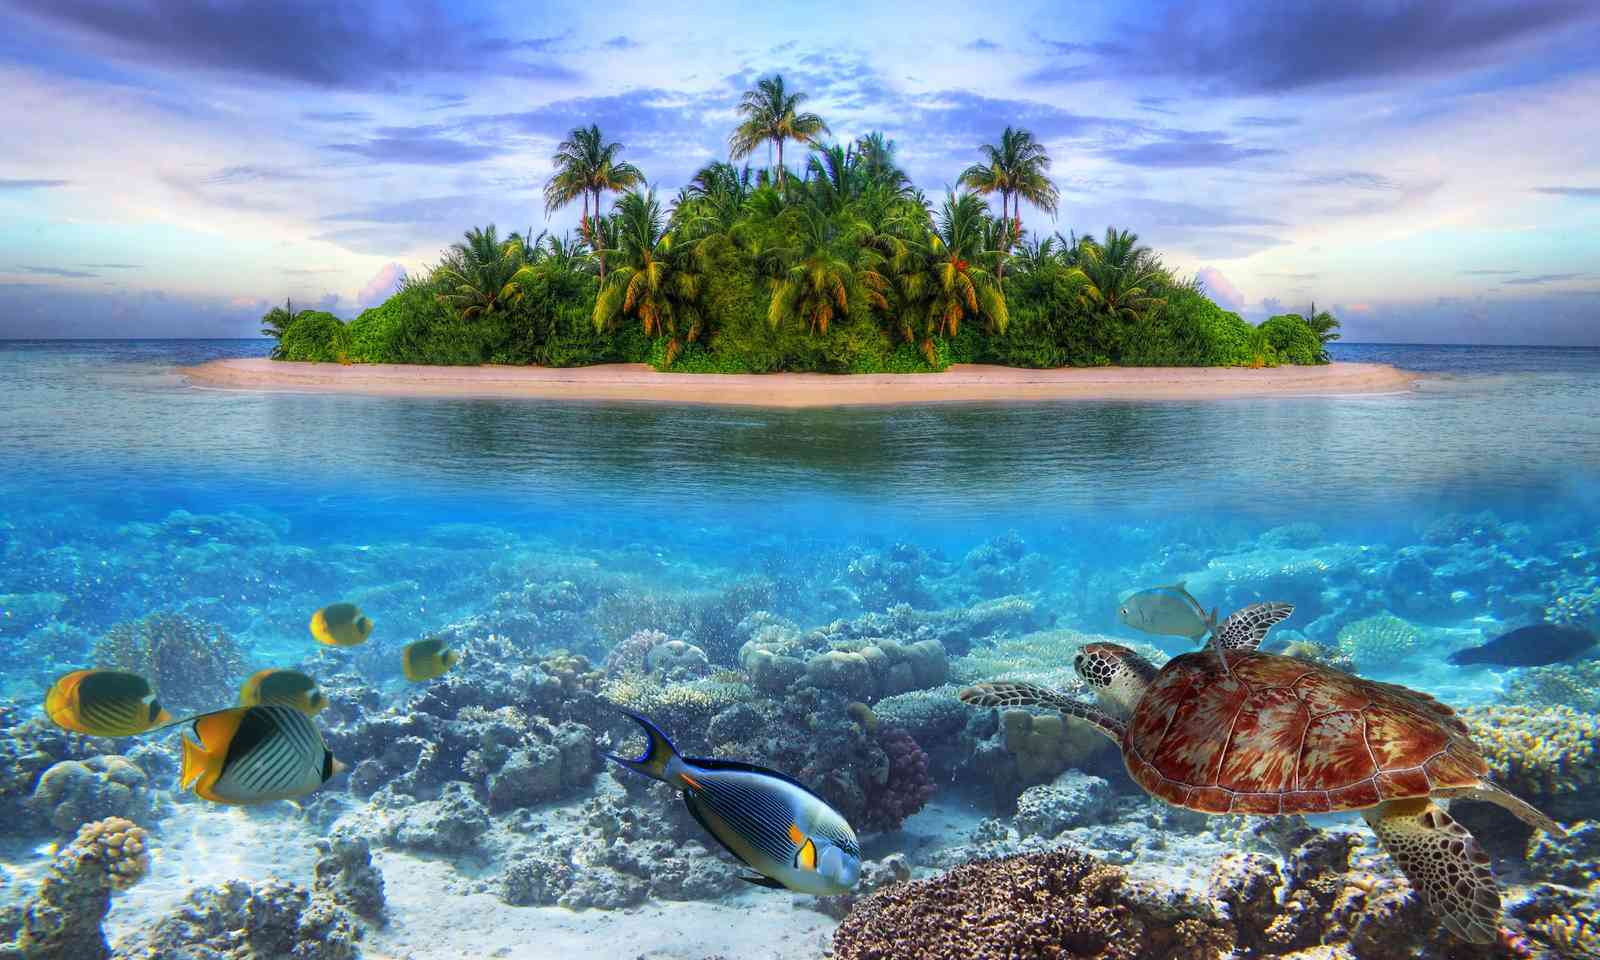 Uninhabited island in the Maldives (Dreamstime)